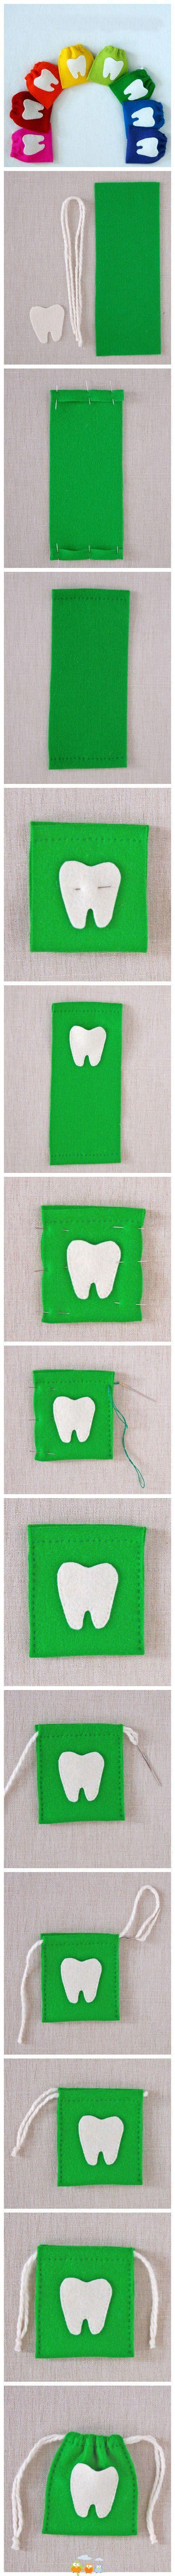 Cute idea for the tooth fairy...